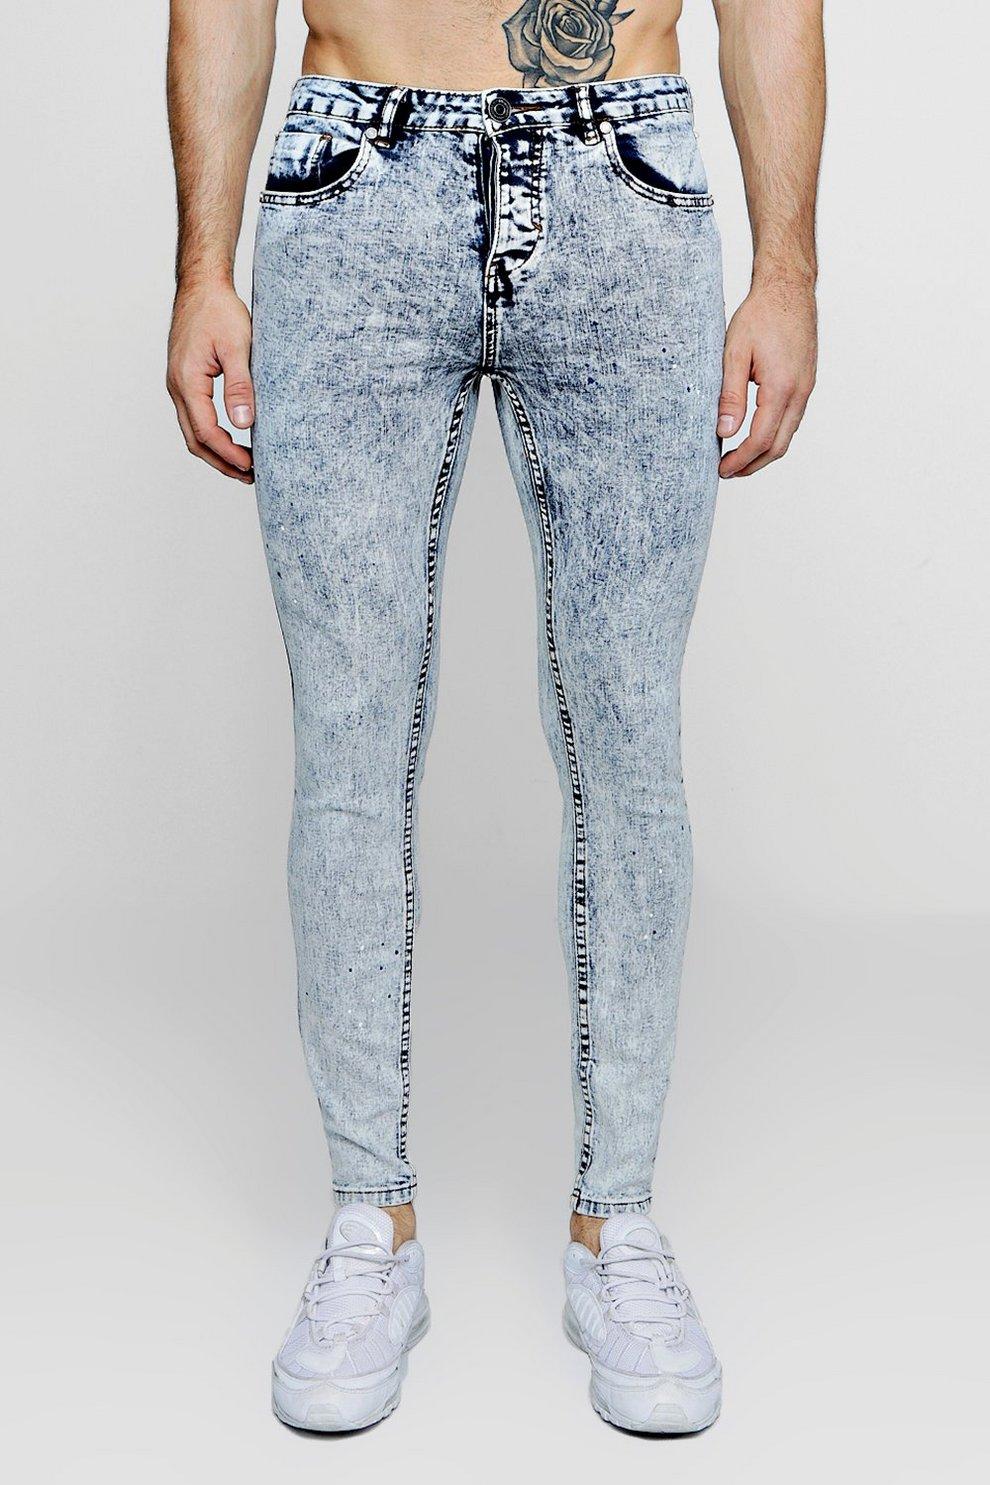 3aba07c9c307 Mens Pale blue Super Skinny Acid Wash Jeans With Paint Splat